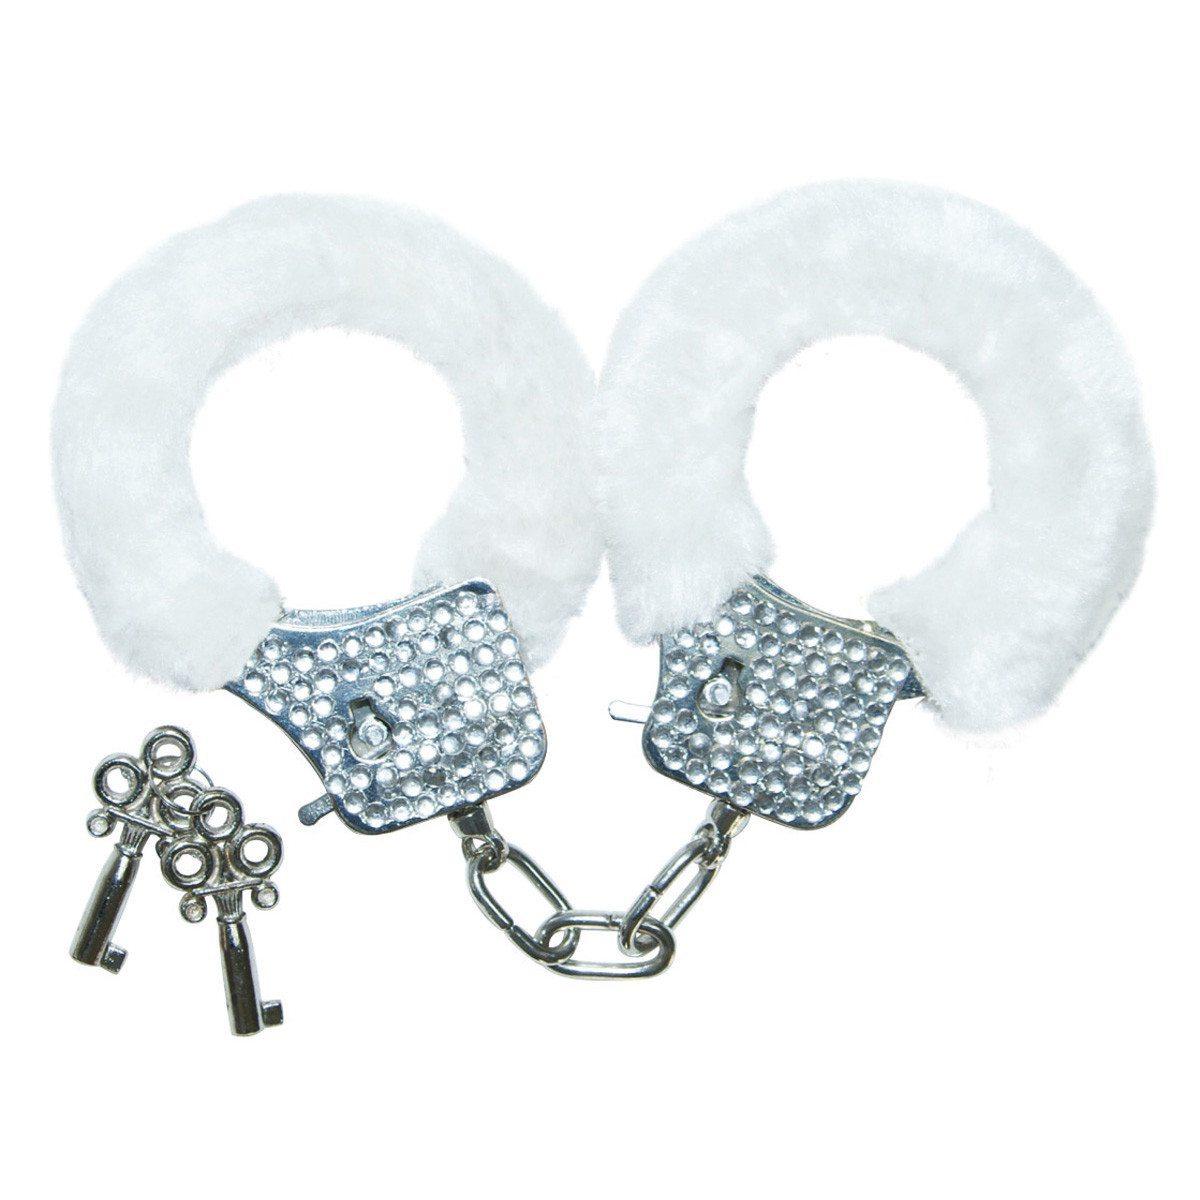 Hochzeits Handschellen